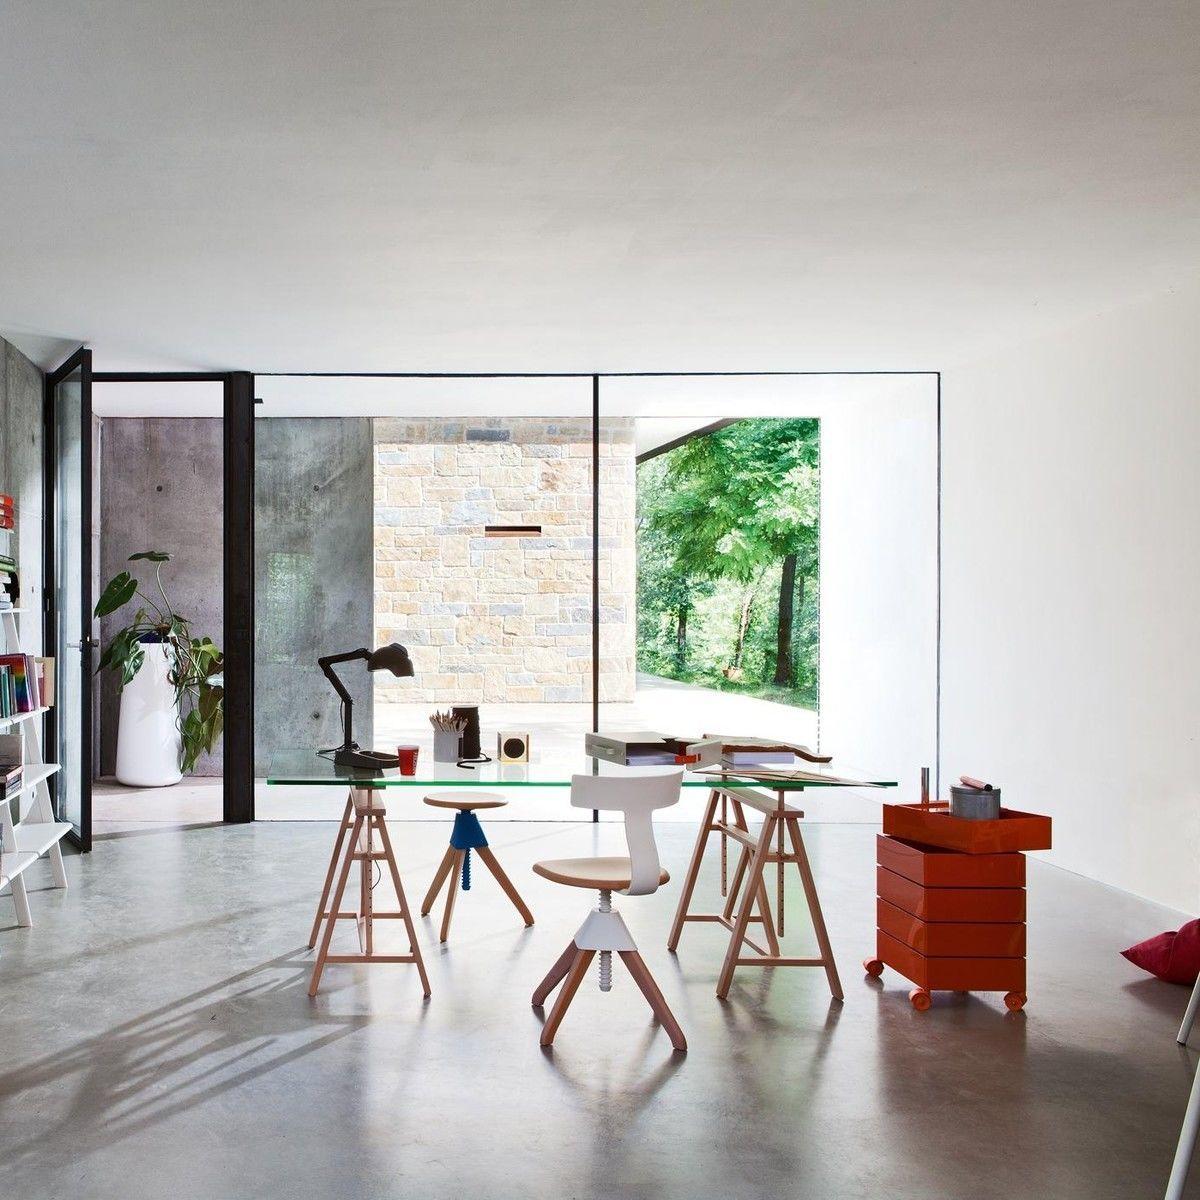 360 container 72 mit rollen magis. Black Bedroom Furniture Sets. Home Design Ideas